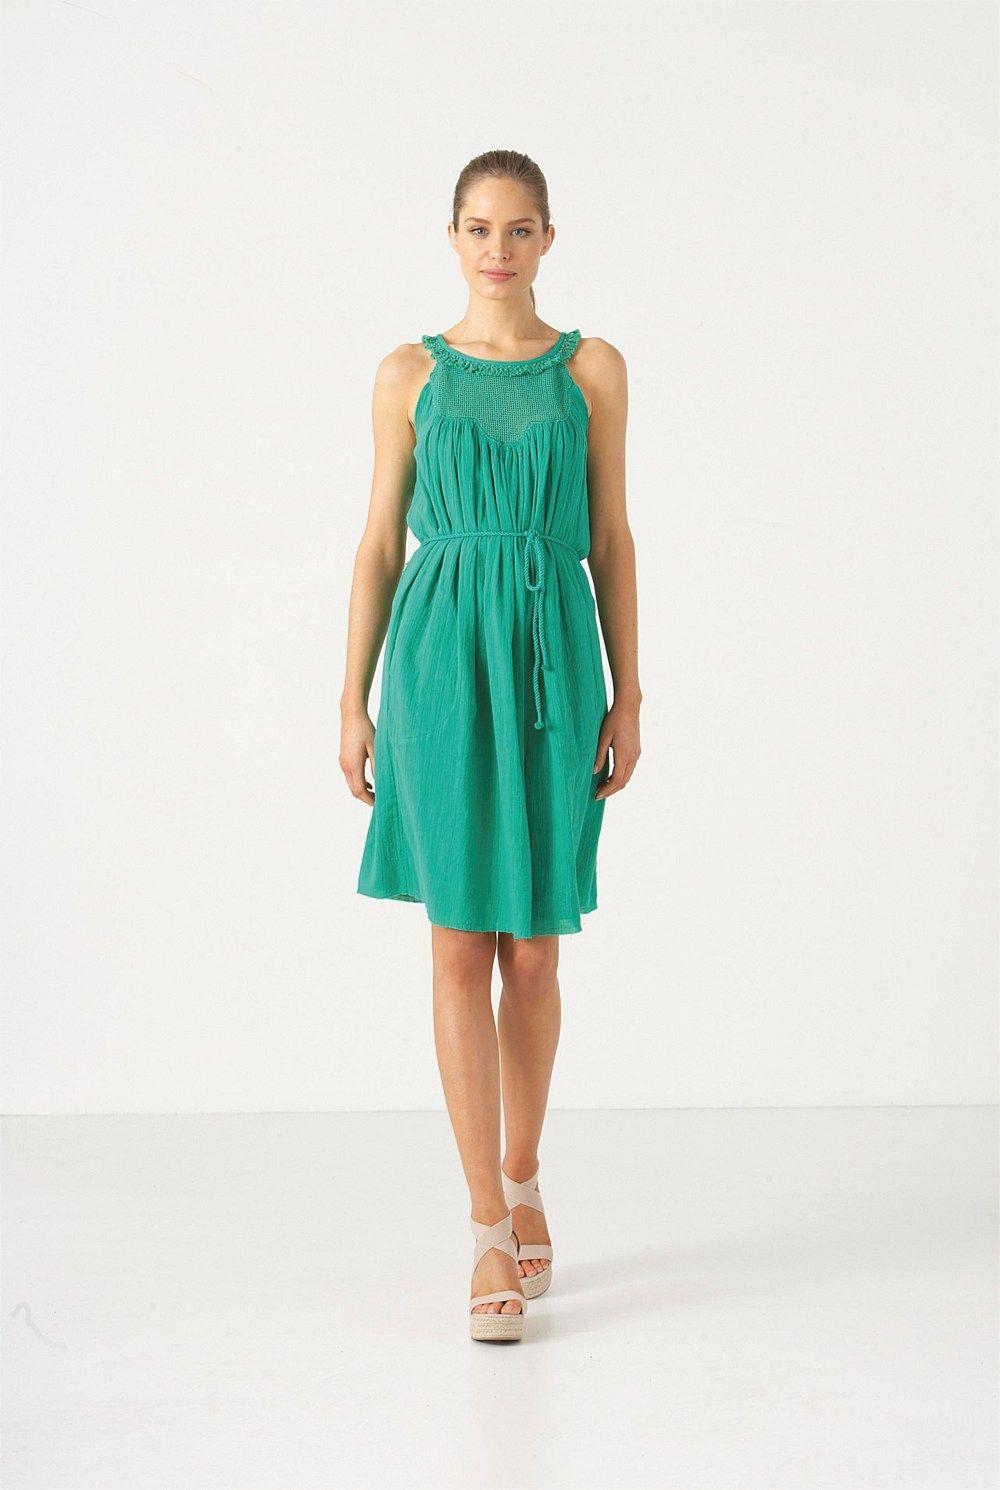 Country Feminine Dresses